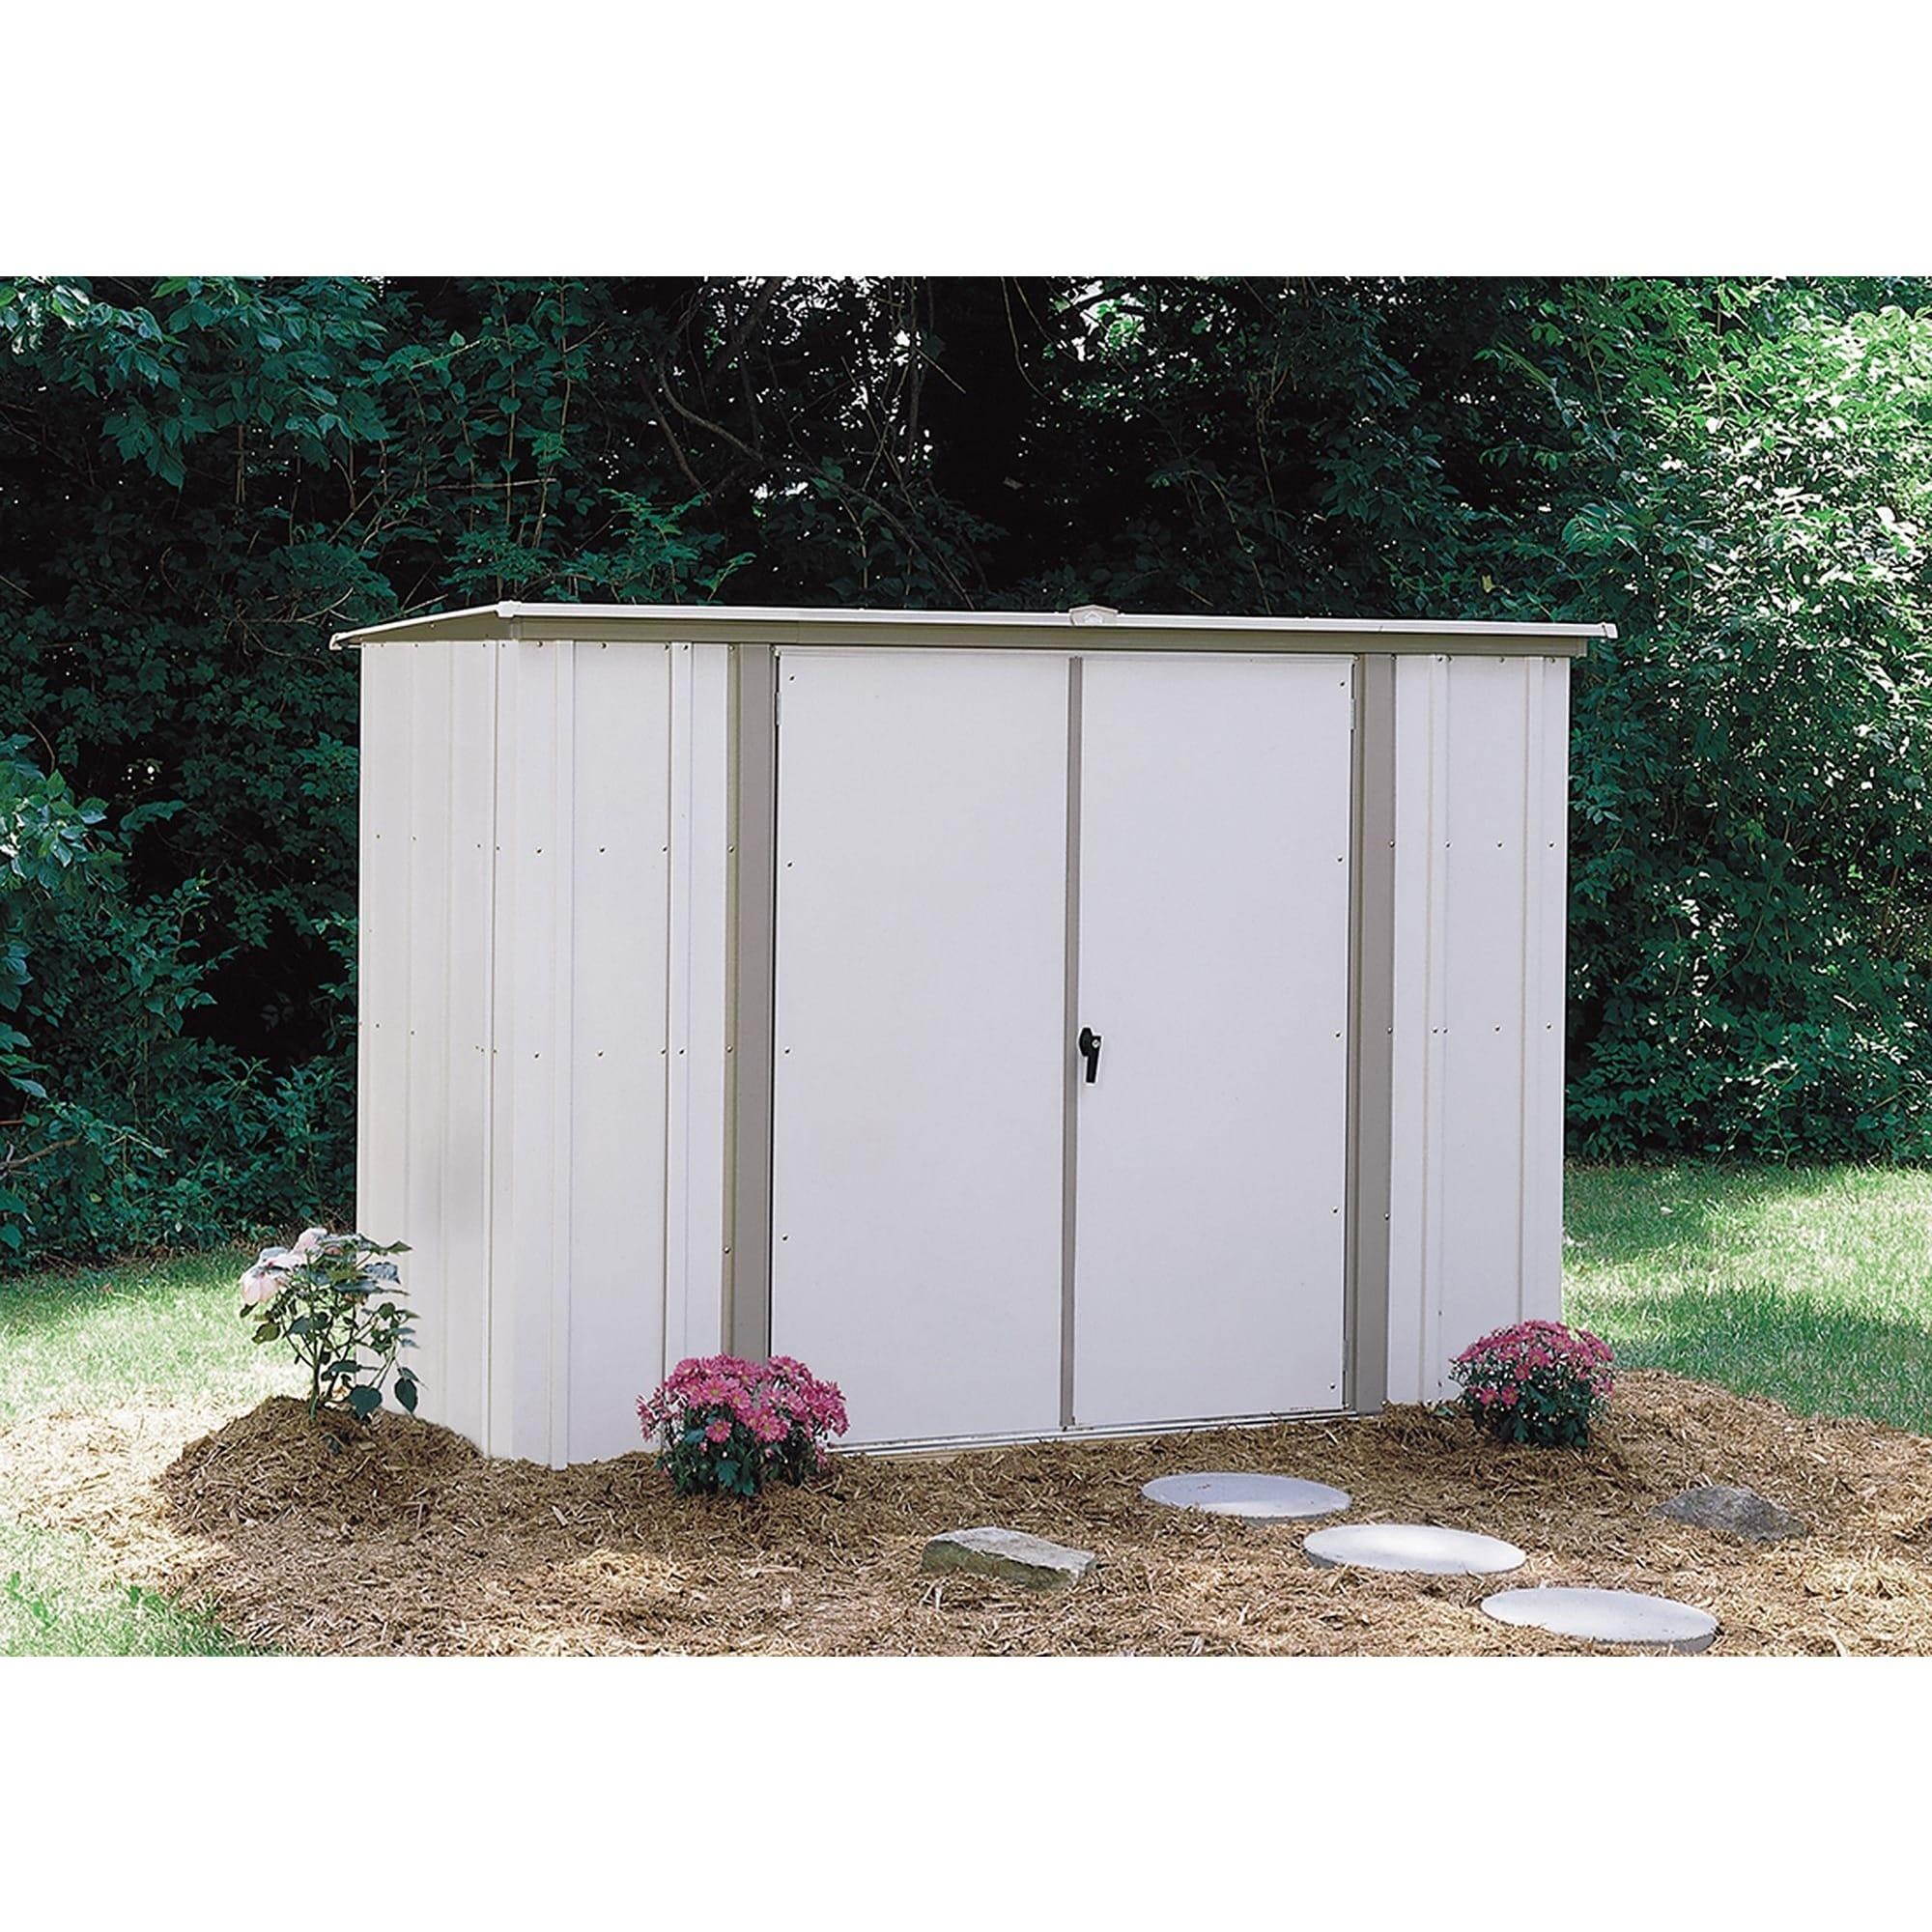 Arrow GS83 C Eggshell Galvanized Steel Garden Shed (8u0027 X 3u0027)   Free  Shipping Today   Overstock   13041757